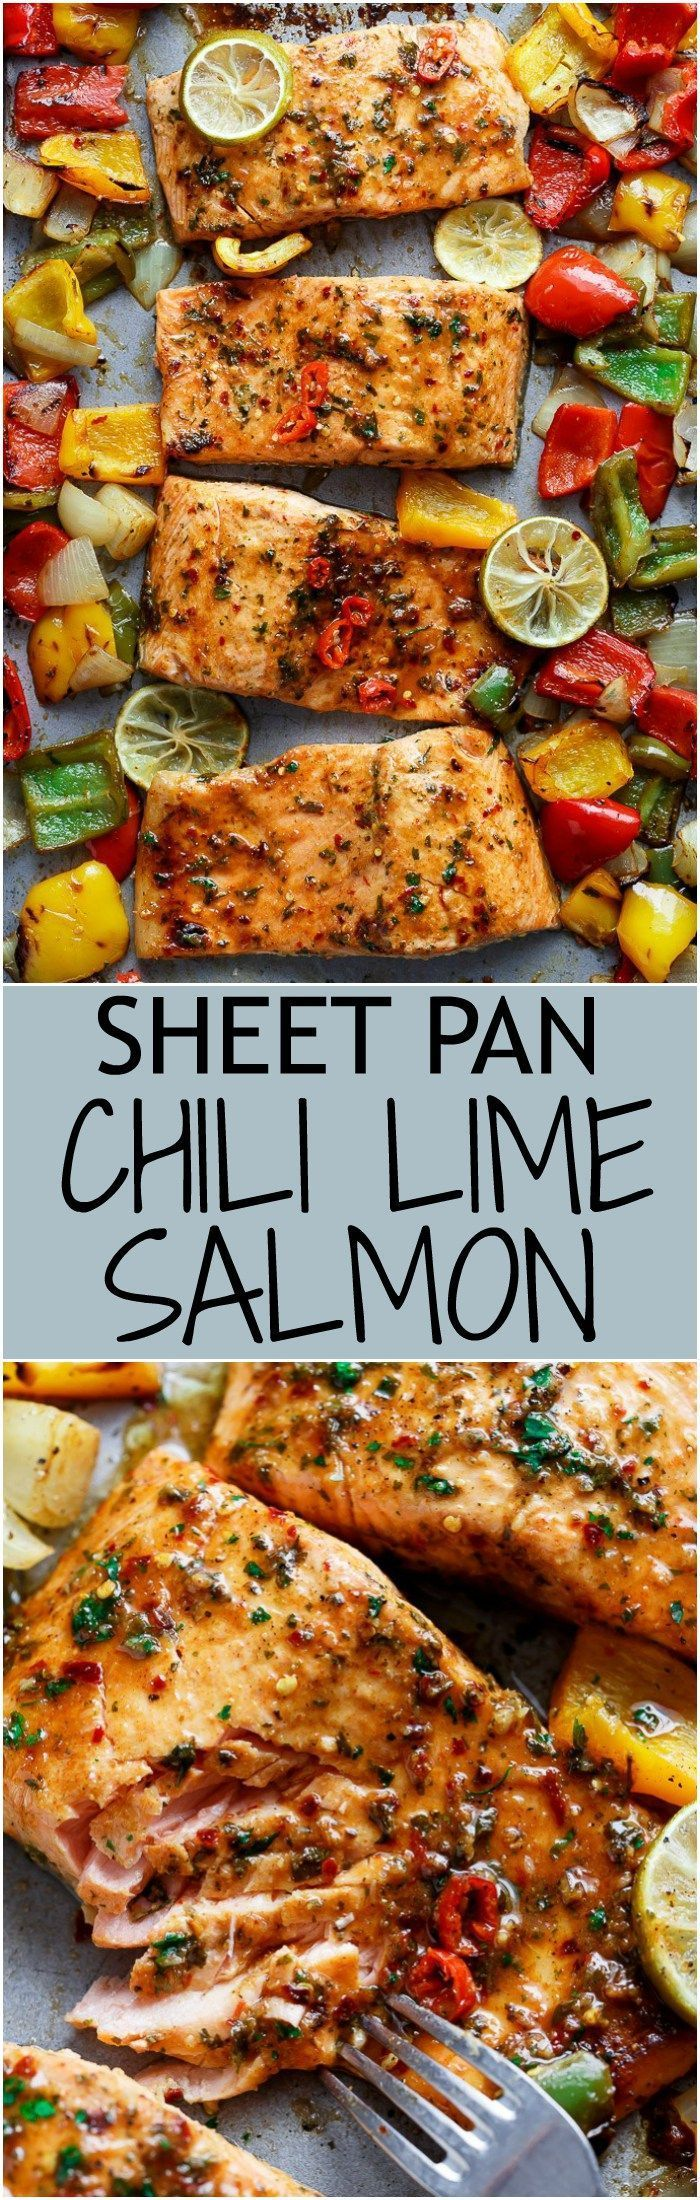 awesome Sheet Pan Chili Lime Salmon - Cafe Delites